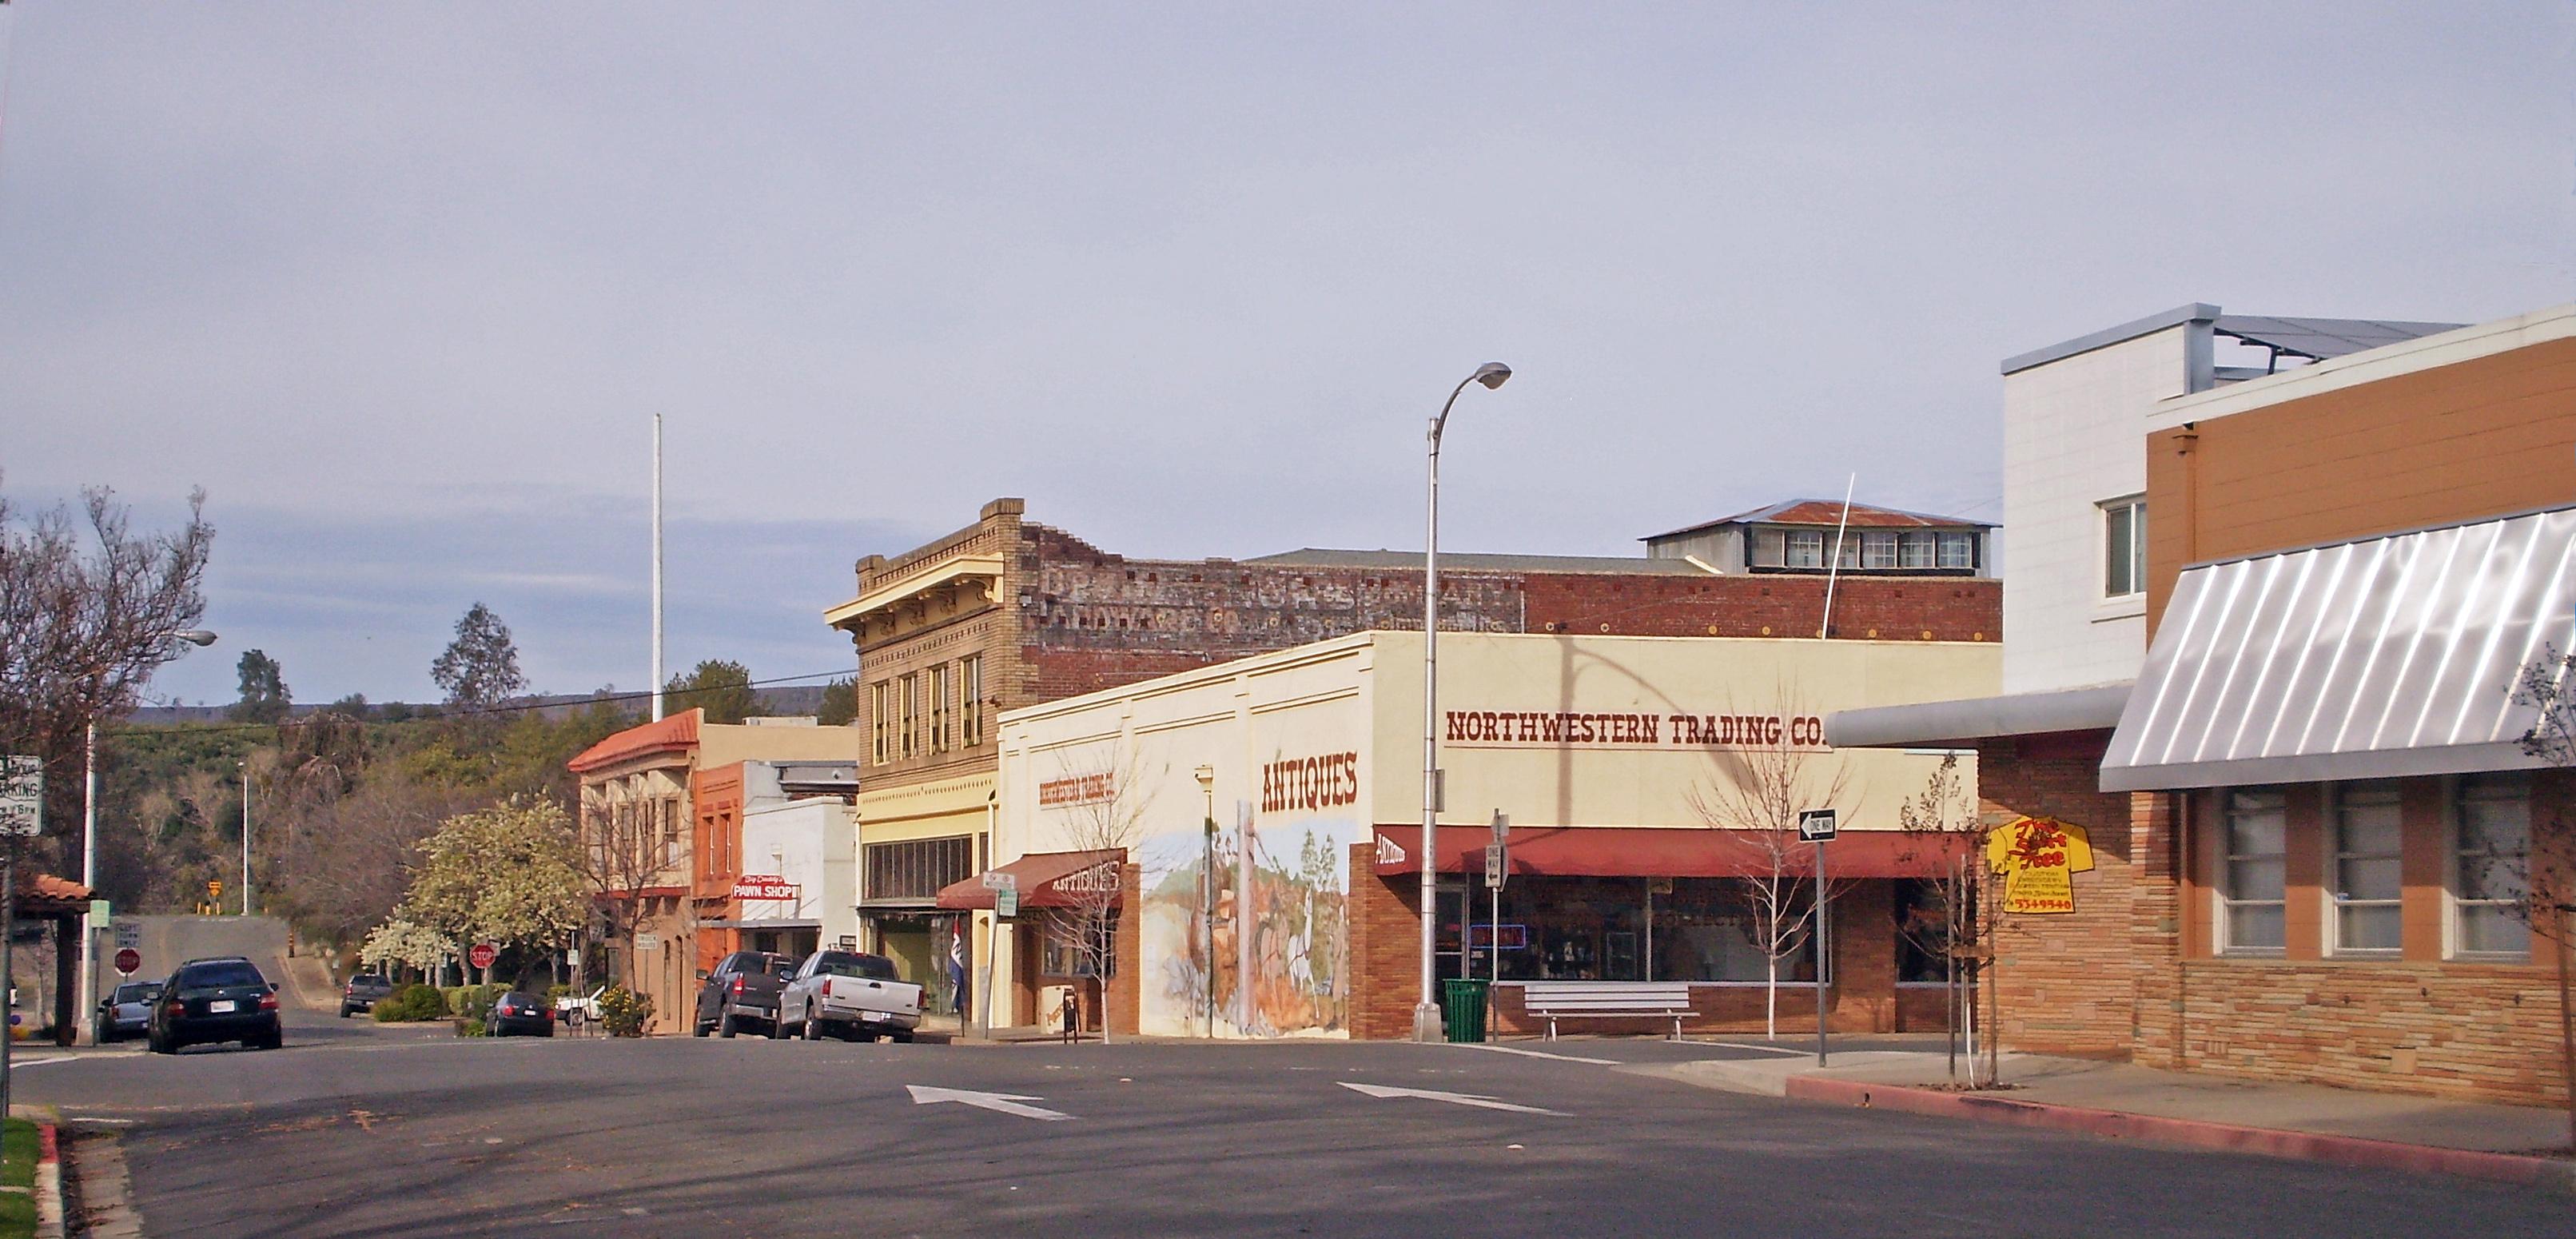 City Of Yuba City Ca Building